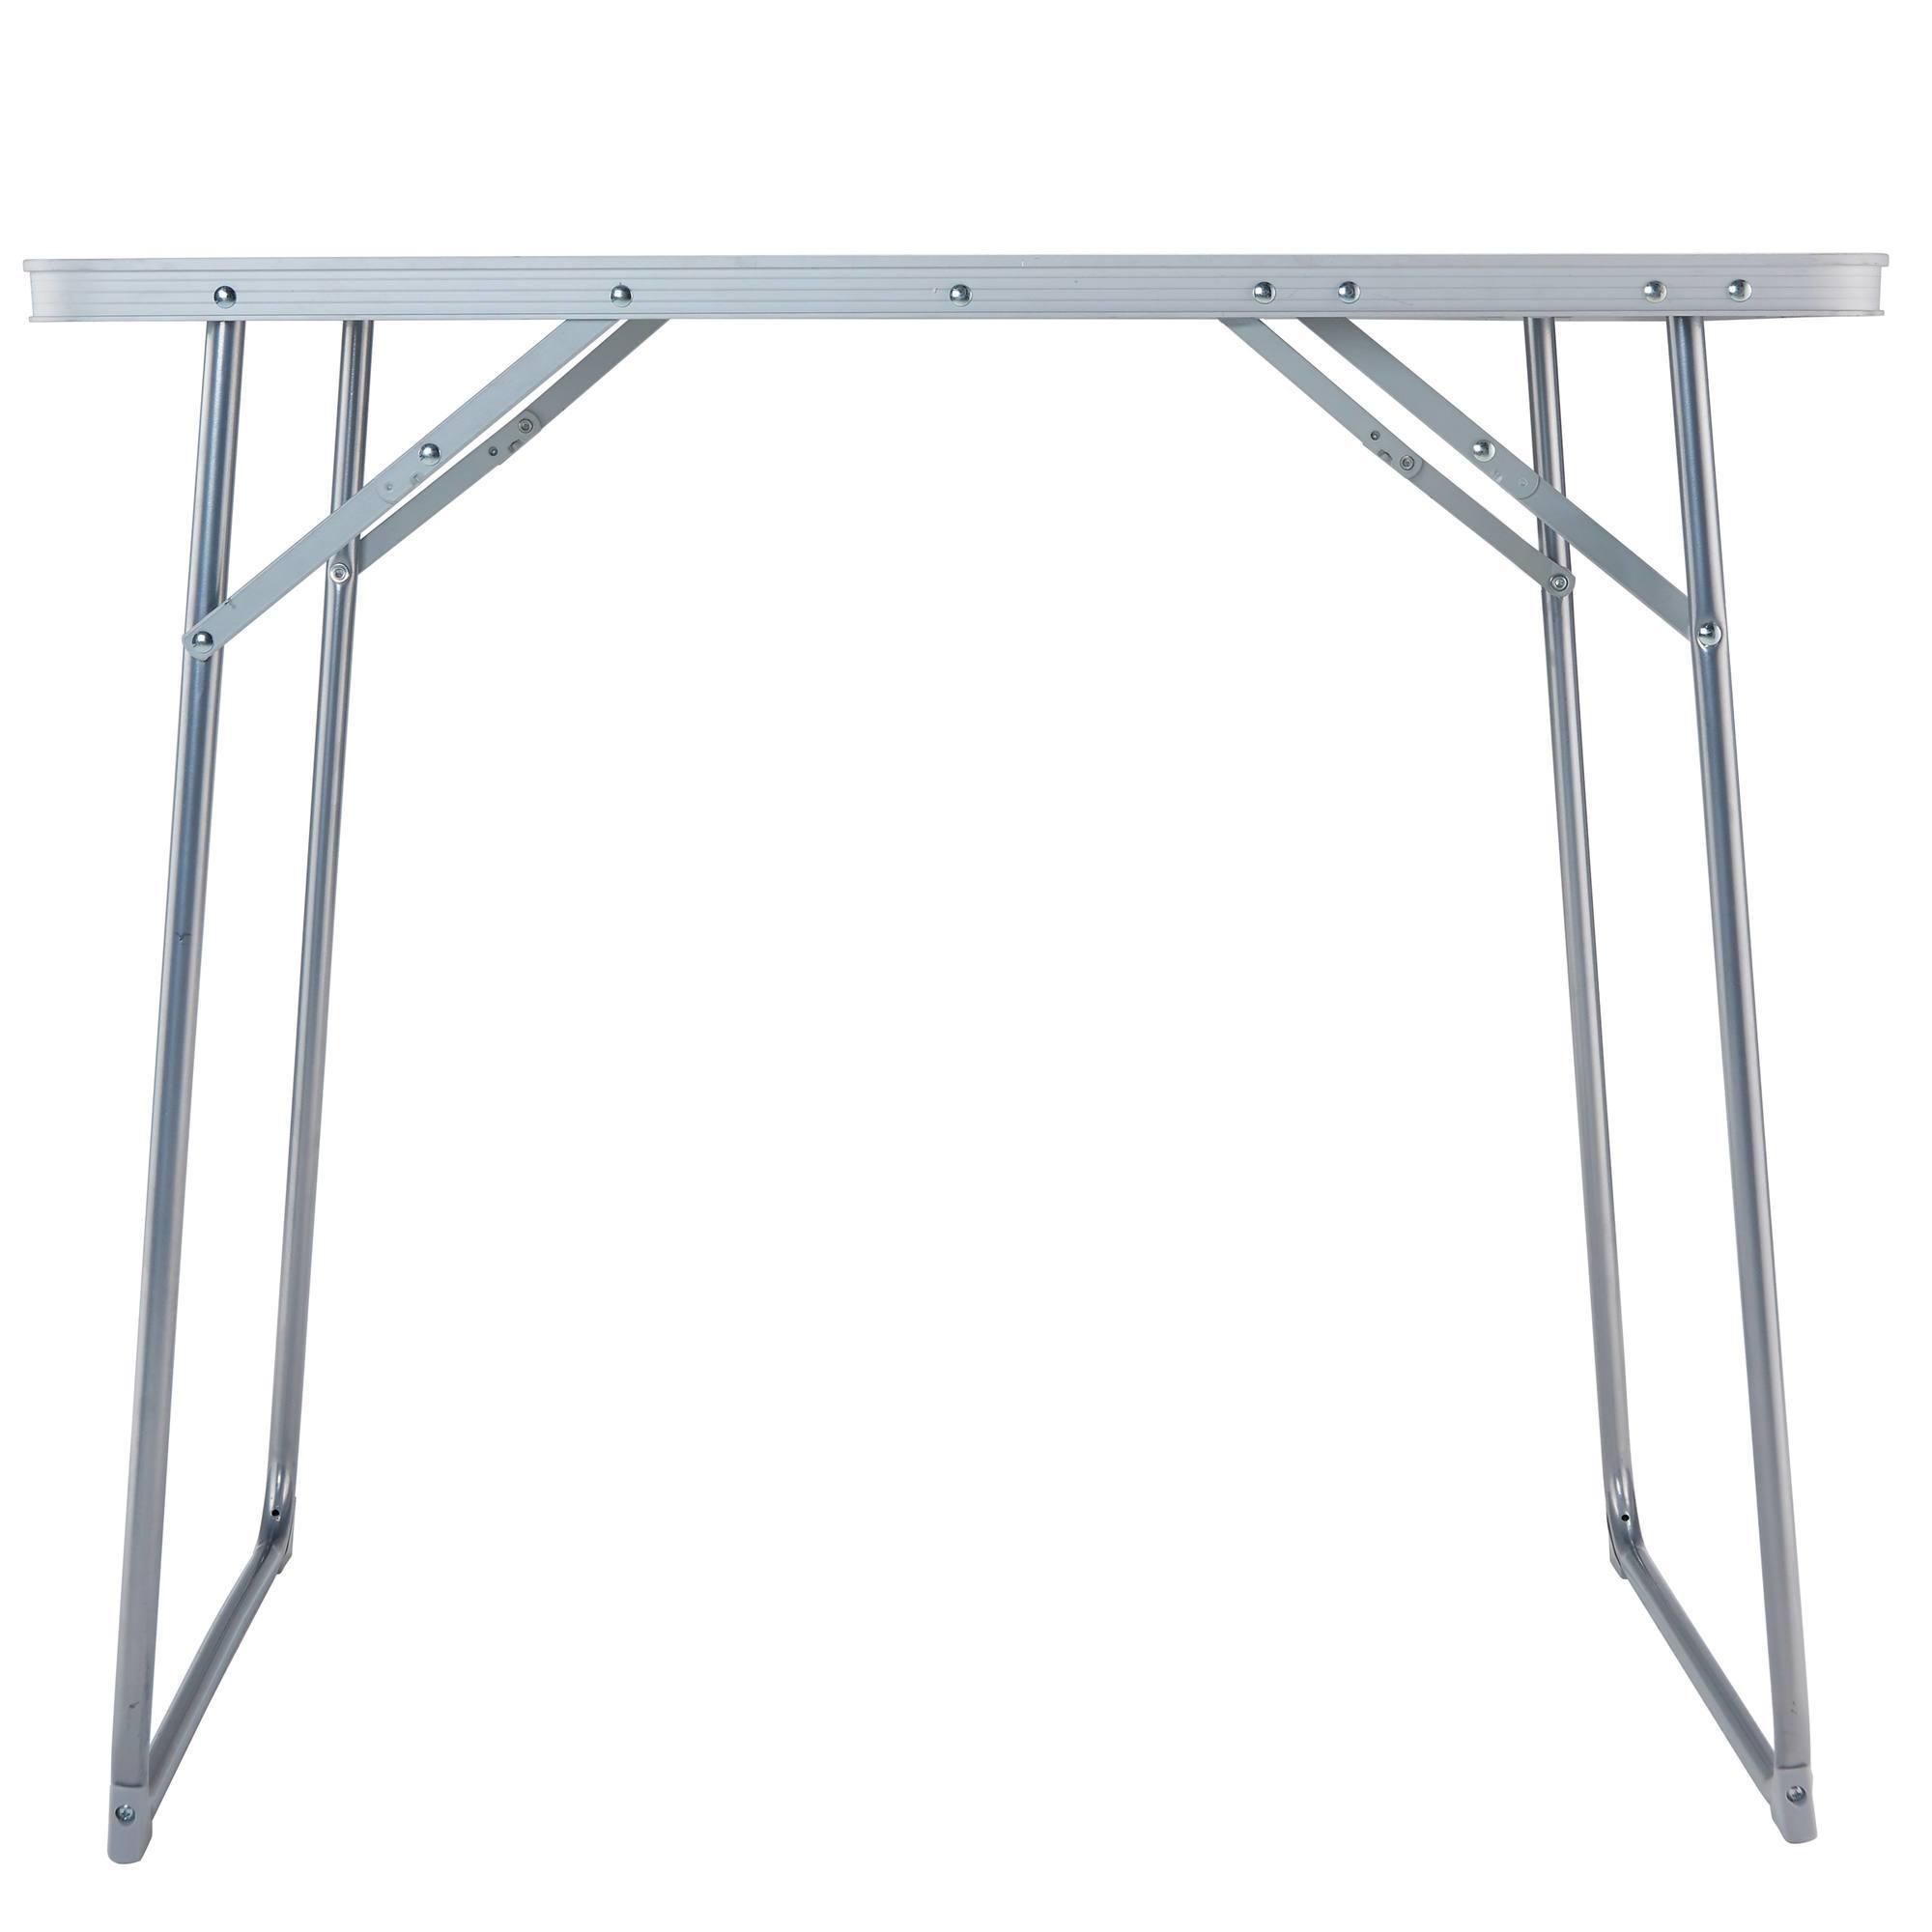 table de camping 4 personnes clubs collectivit s decathlon pro. Black Bedroom Furniture Sets. Home Design Ideas